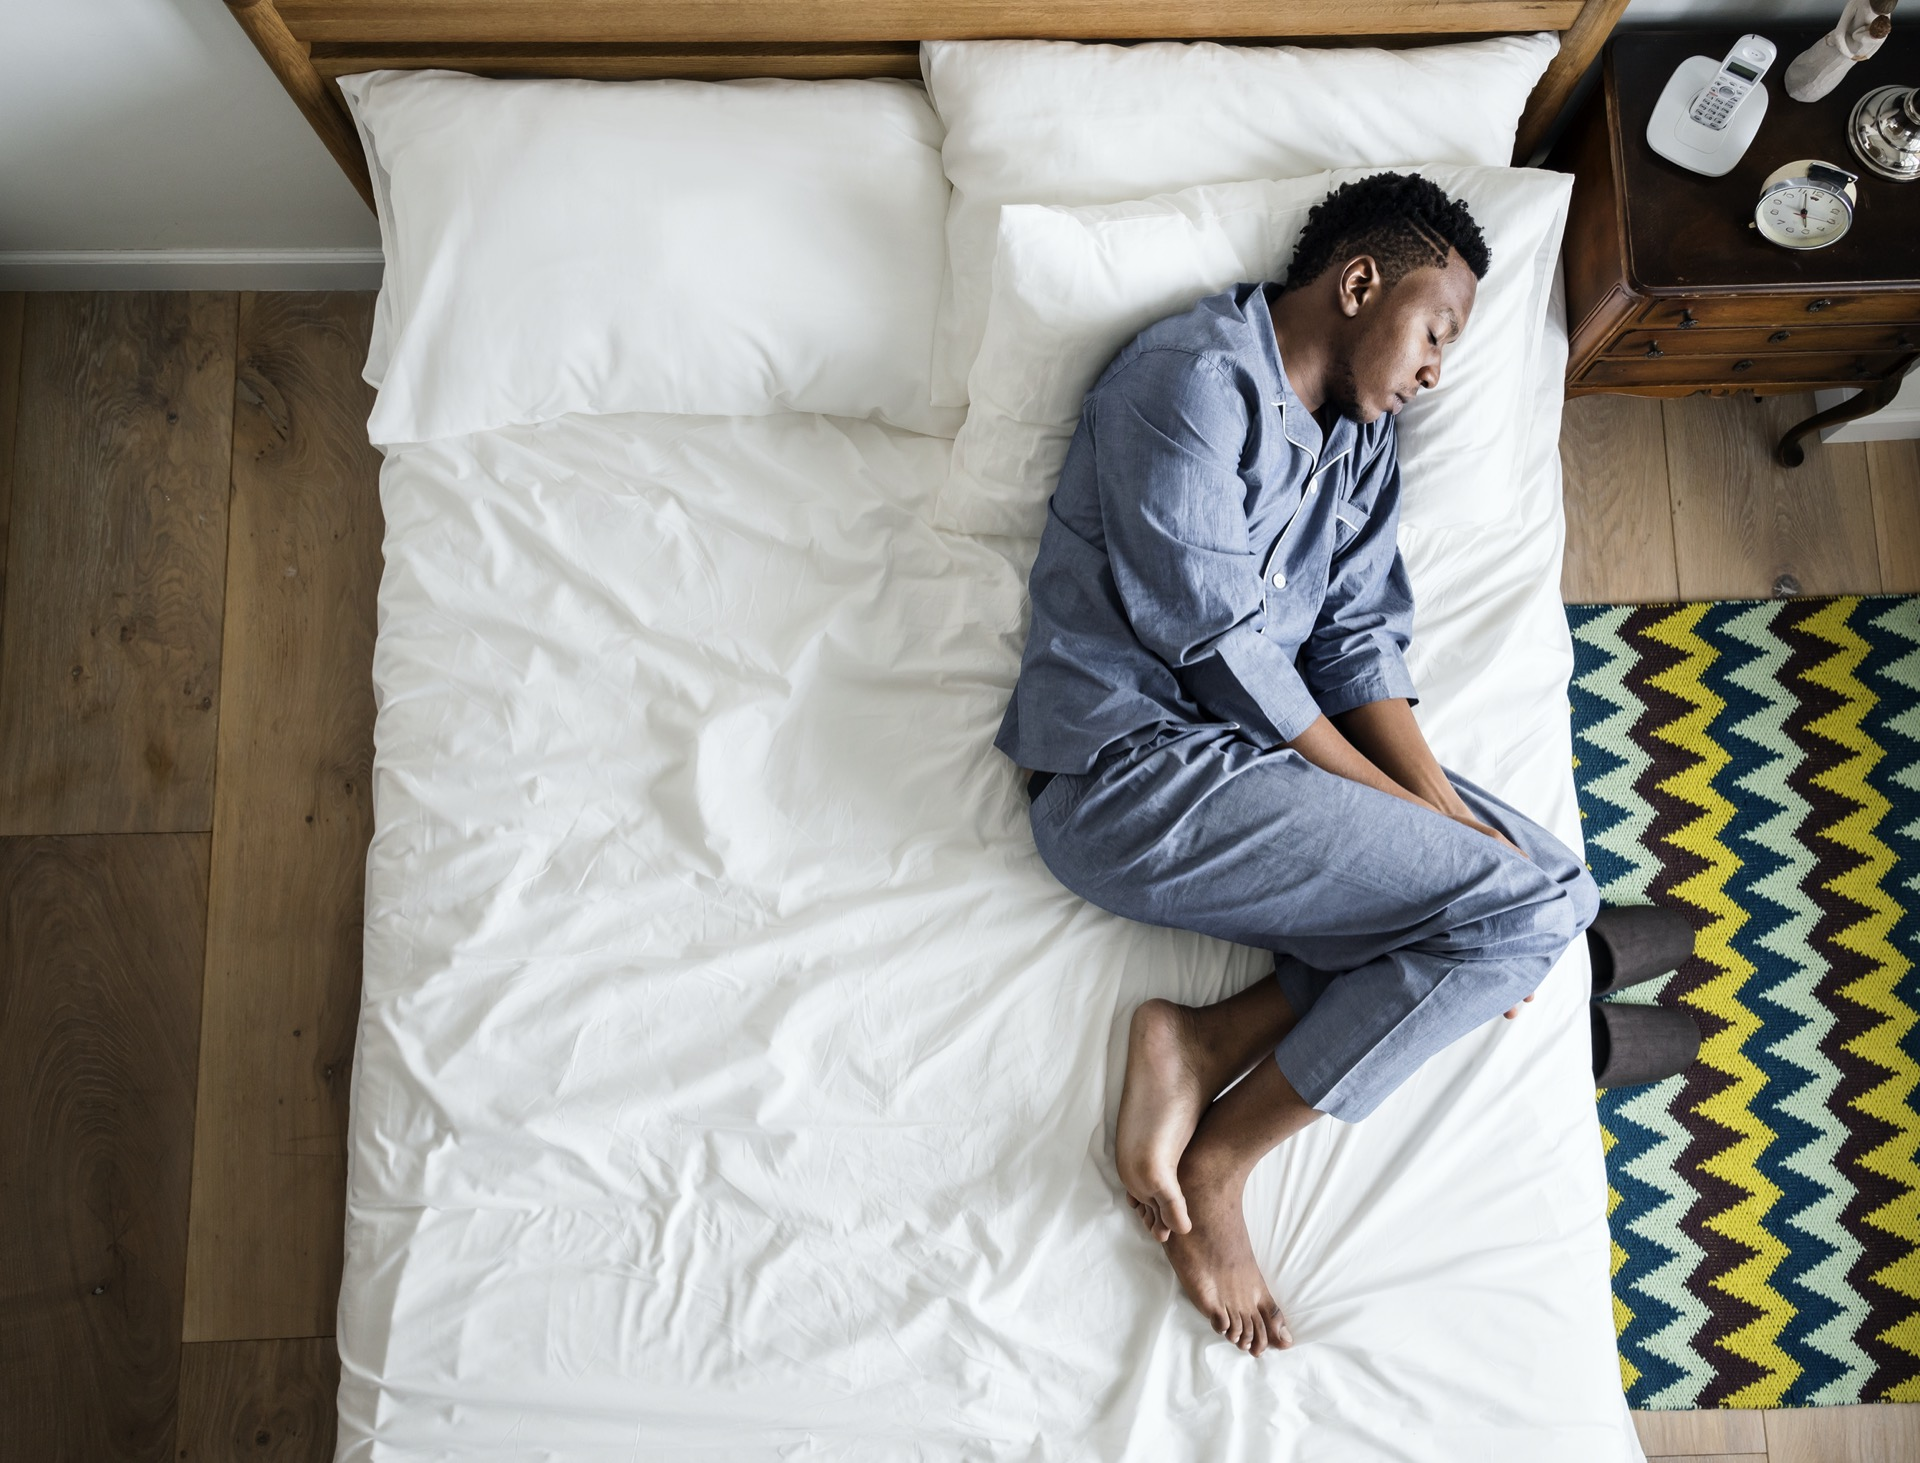 ¿Sabes Qué Dice Sobre Ti La Postura En La Que Duermes?